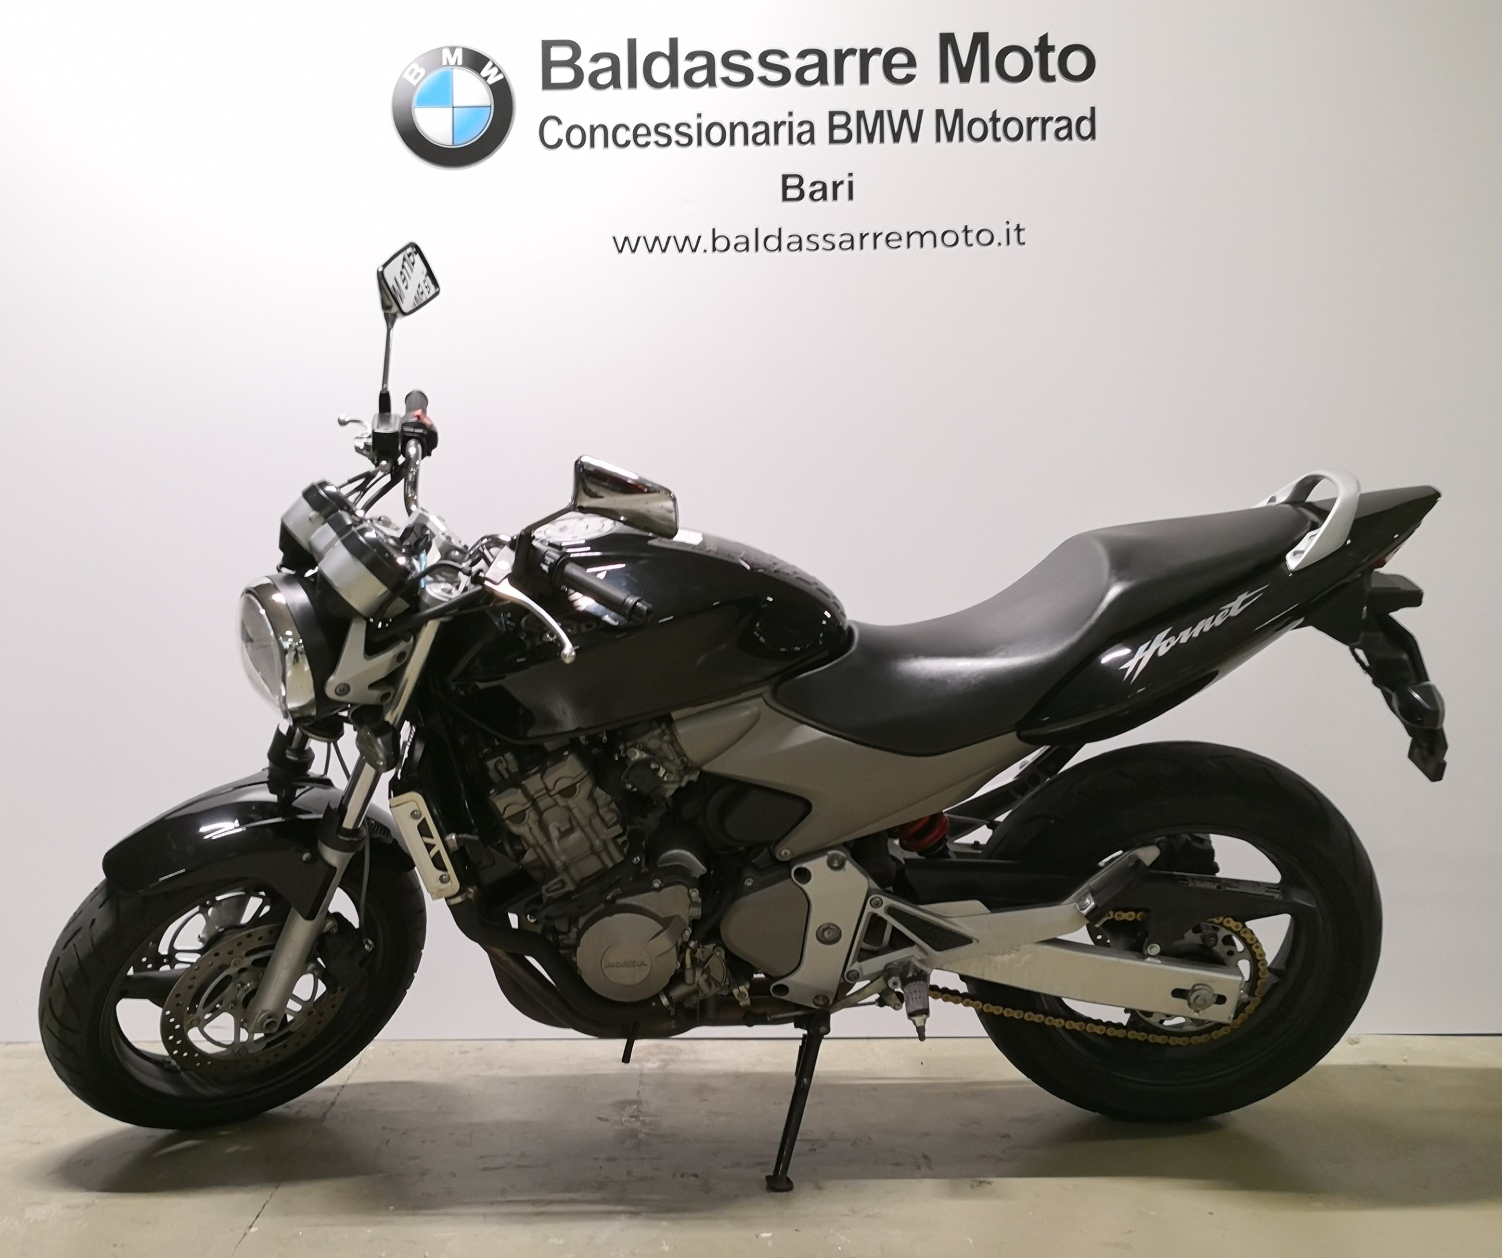 Moto Usate Bari Bmw Kawasaki Kymko Peugeot Tutte Le Marche